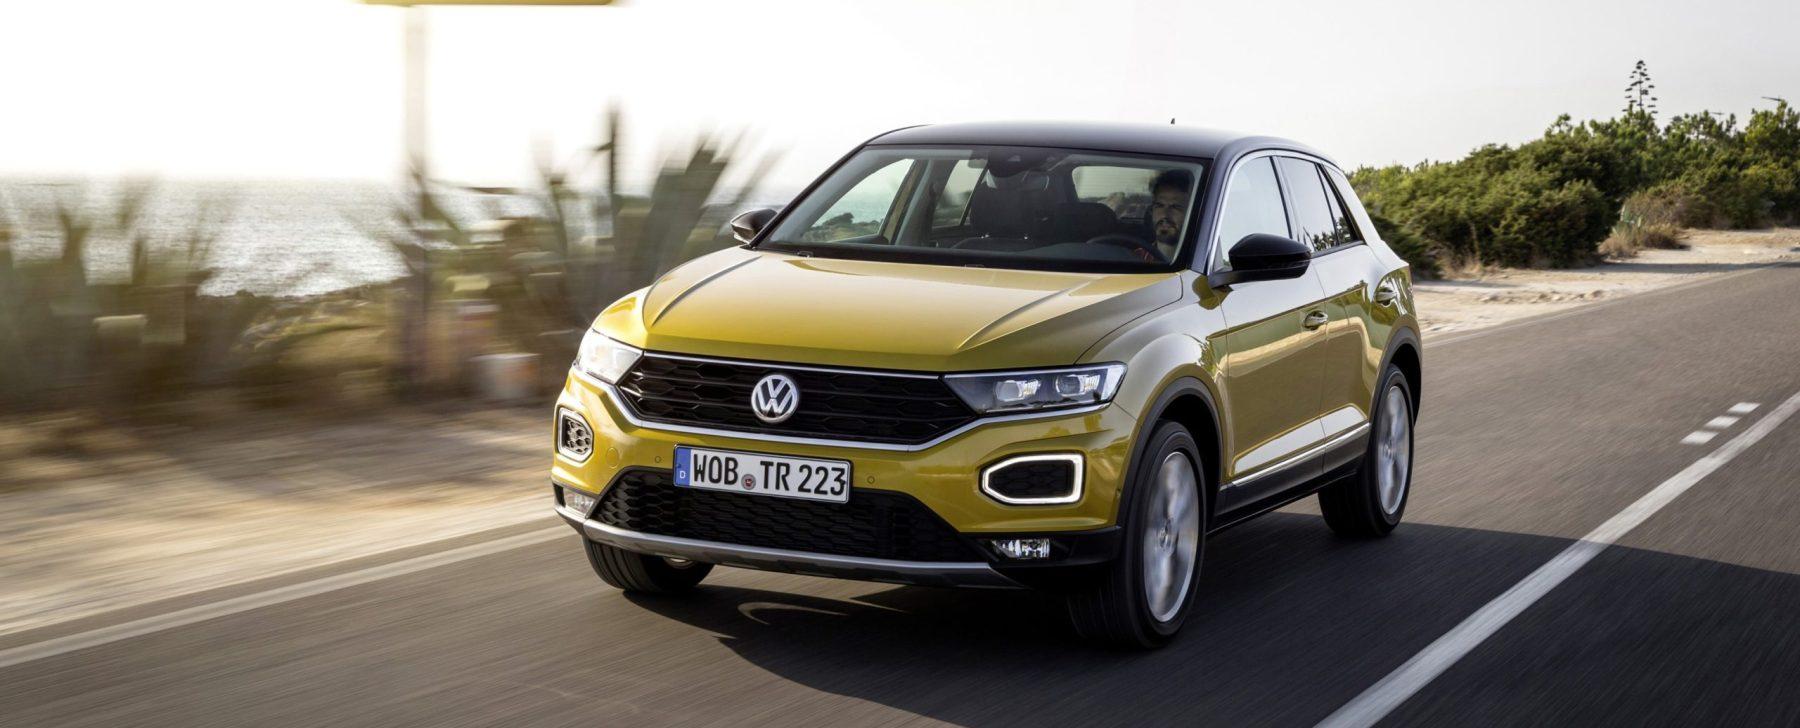 Volkswagen T-Roc, con diésel cumple mejor como familiar